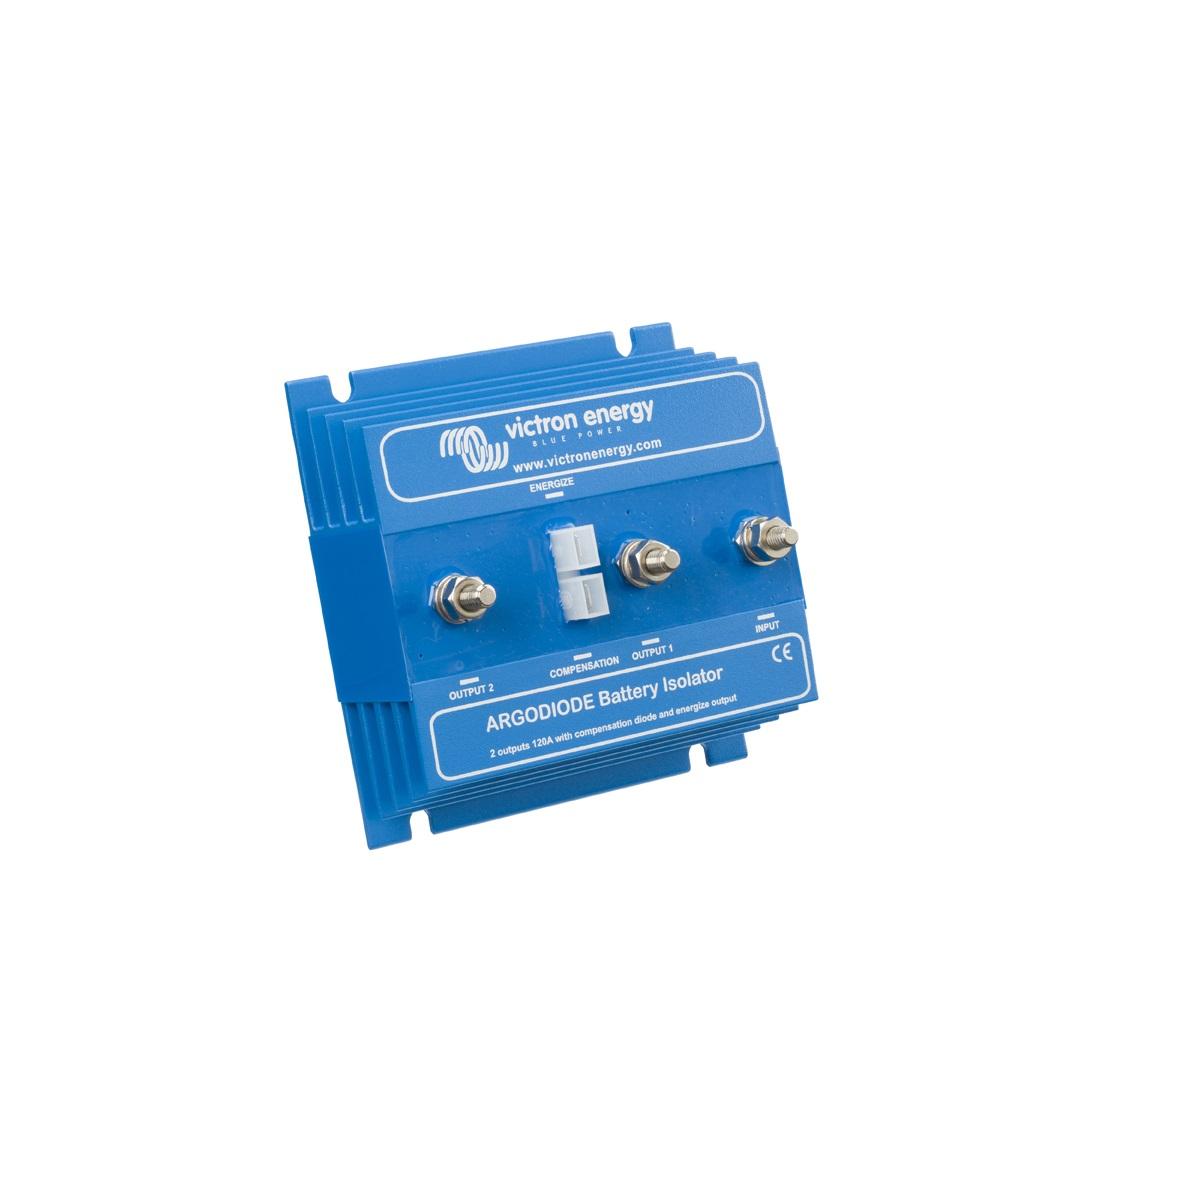 Victron Energy Argodiode 80-2SC Batterie Isolator Victron Energy ...